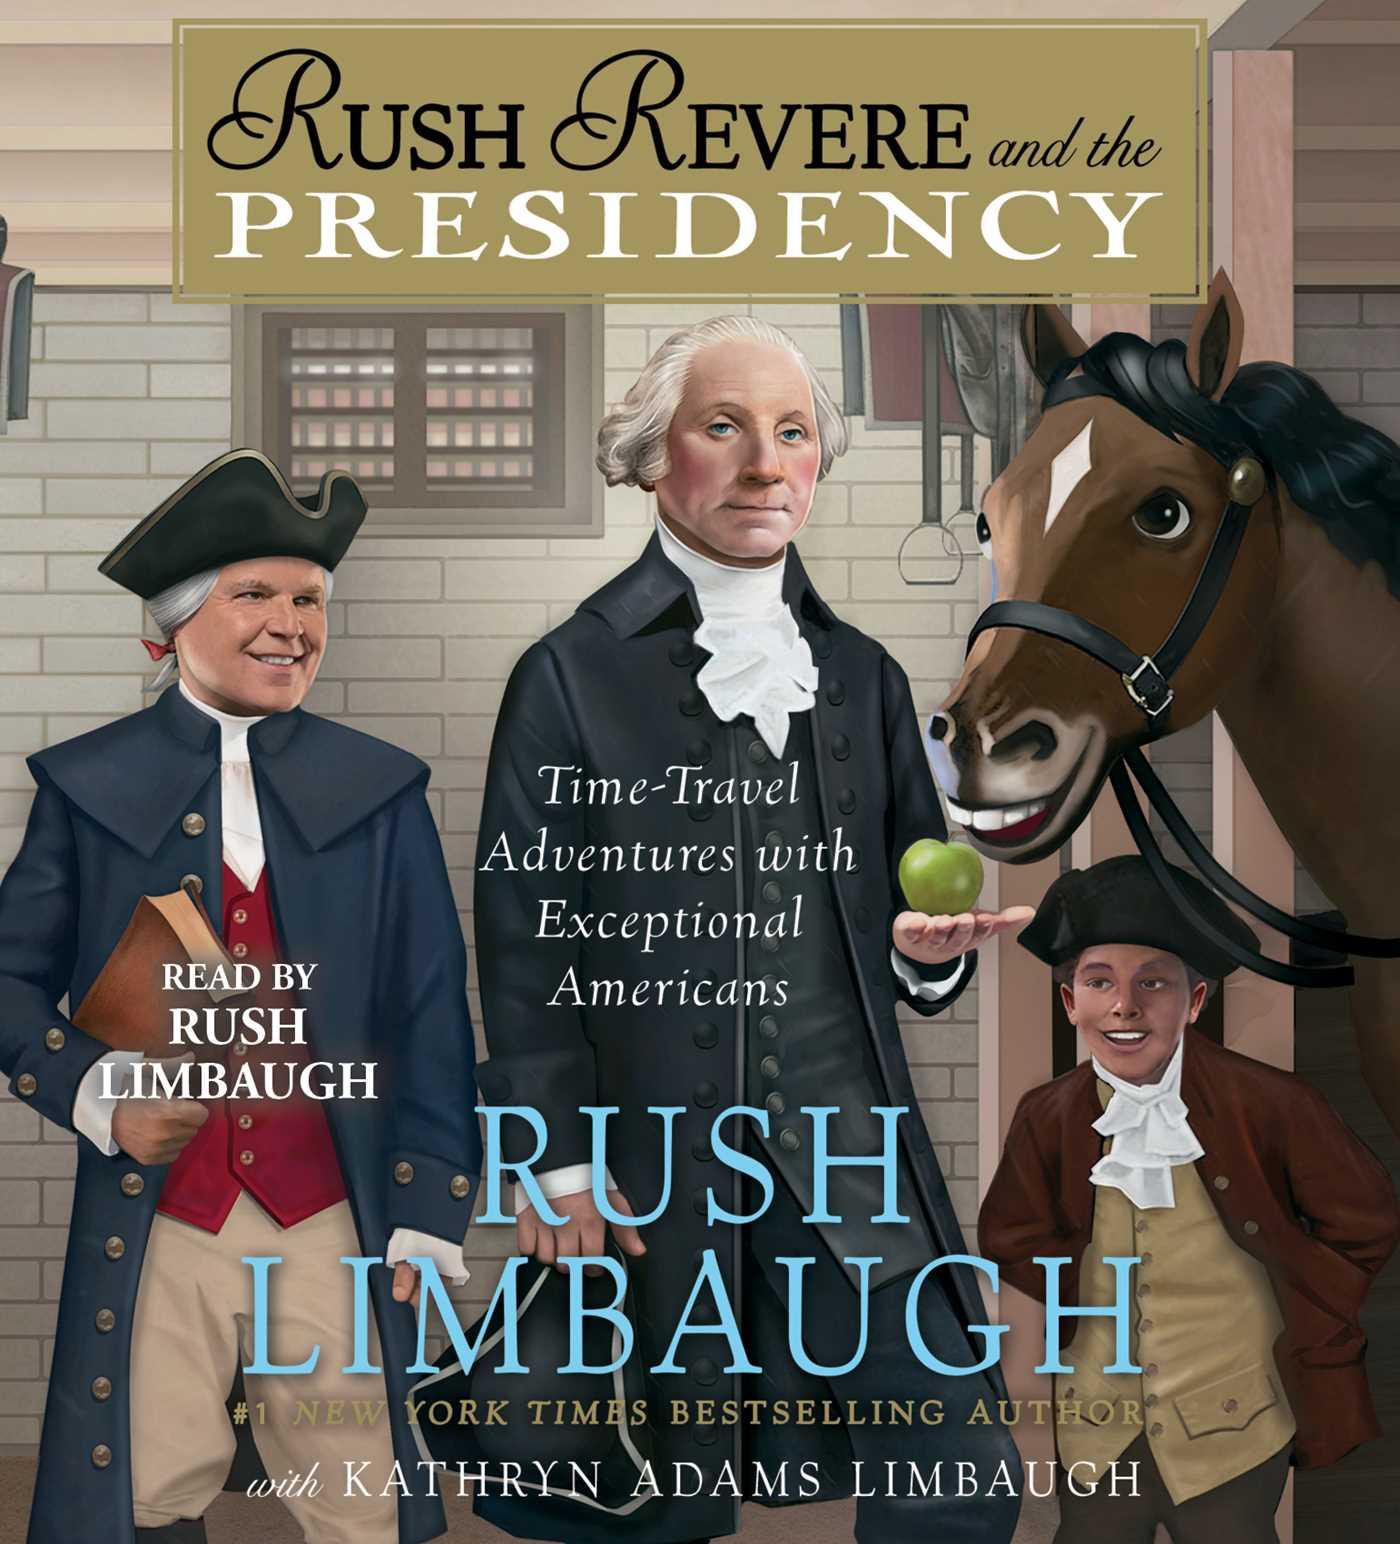 Rush revere and the presidency 9781508227458 hr